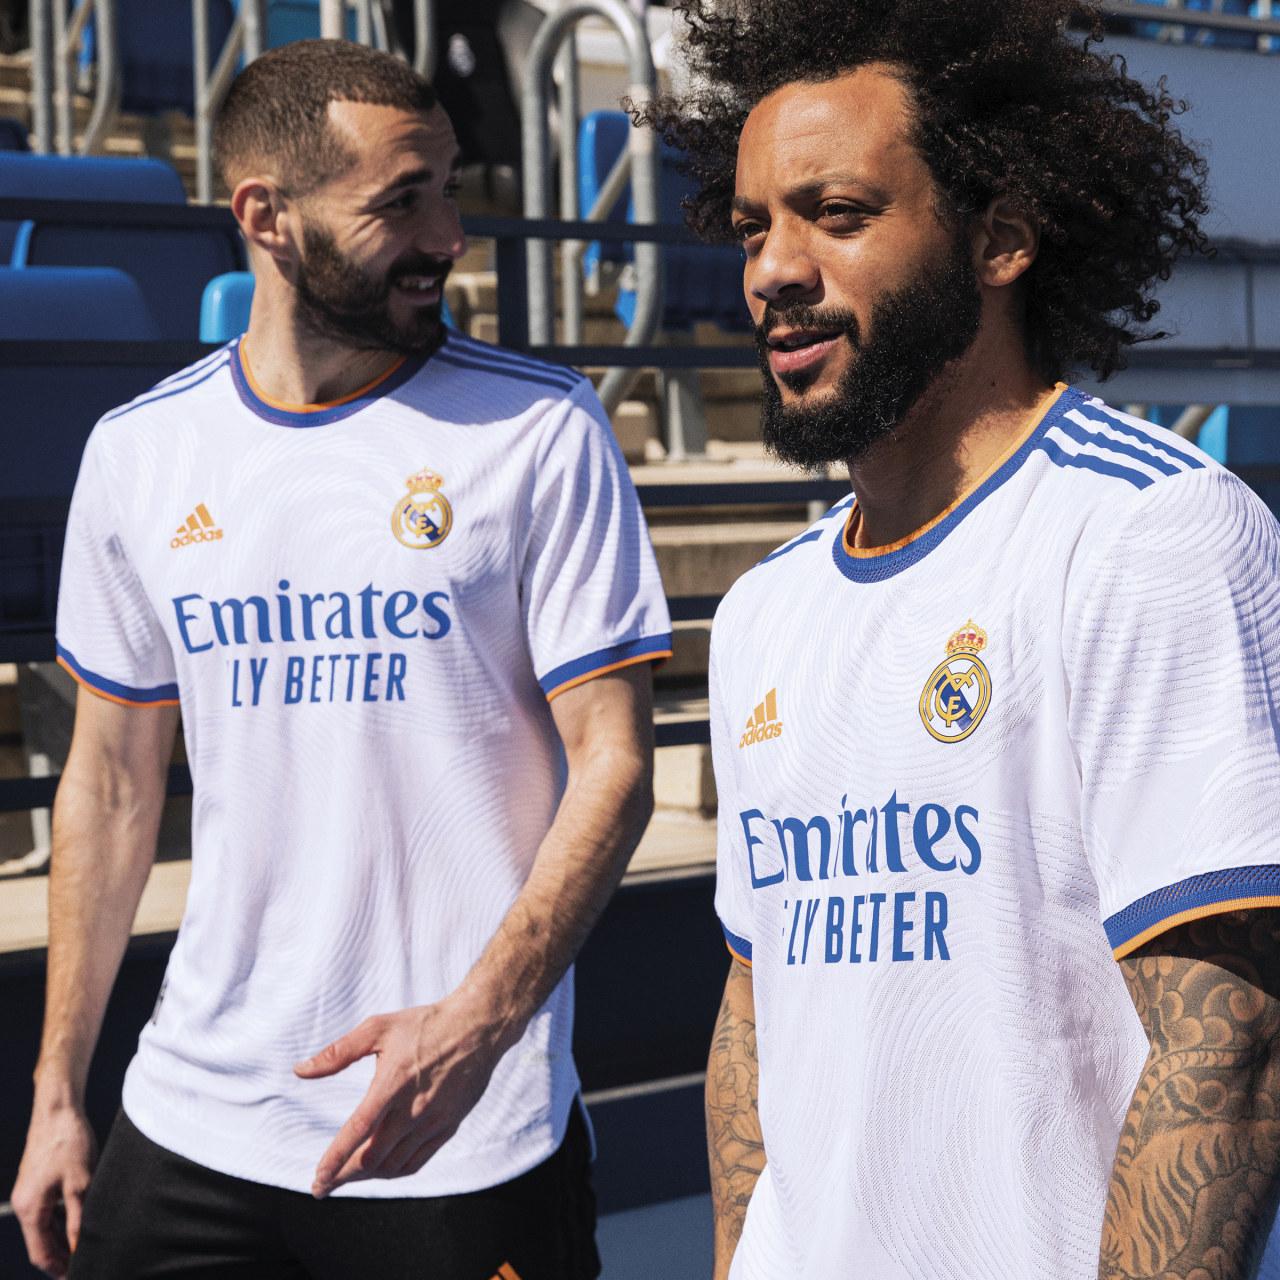 Camisas do Real Madrid 2021-2022 Adidas